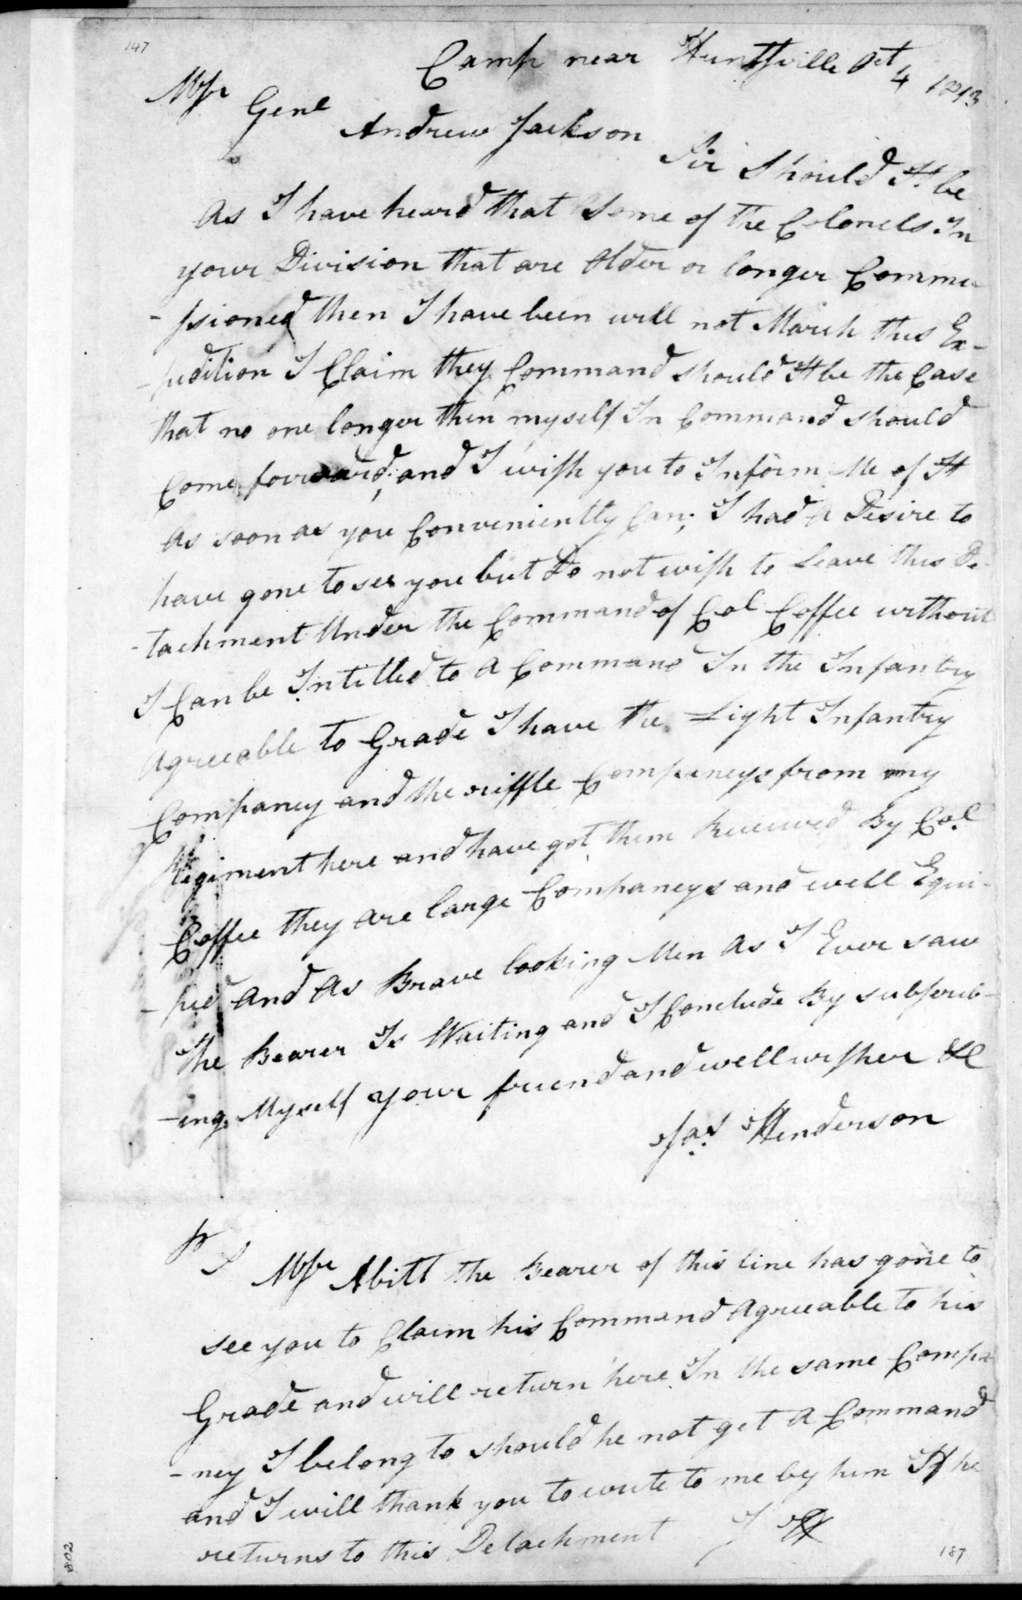 James Henderson to Andrew Jackson, October 4, 1813